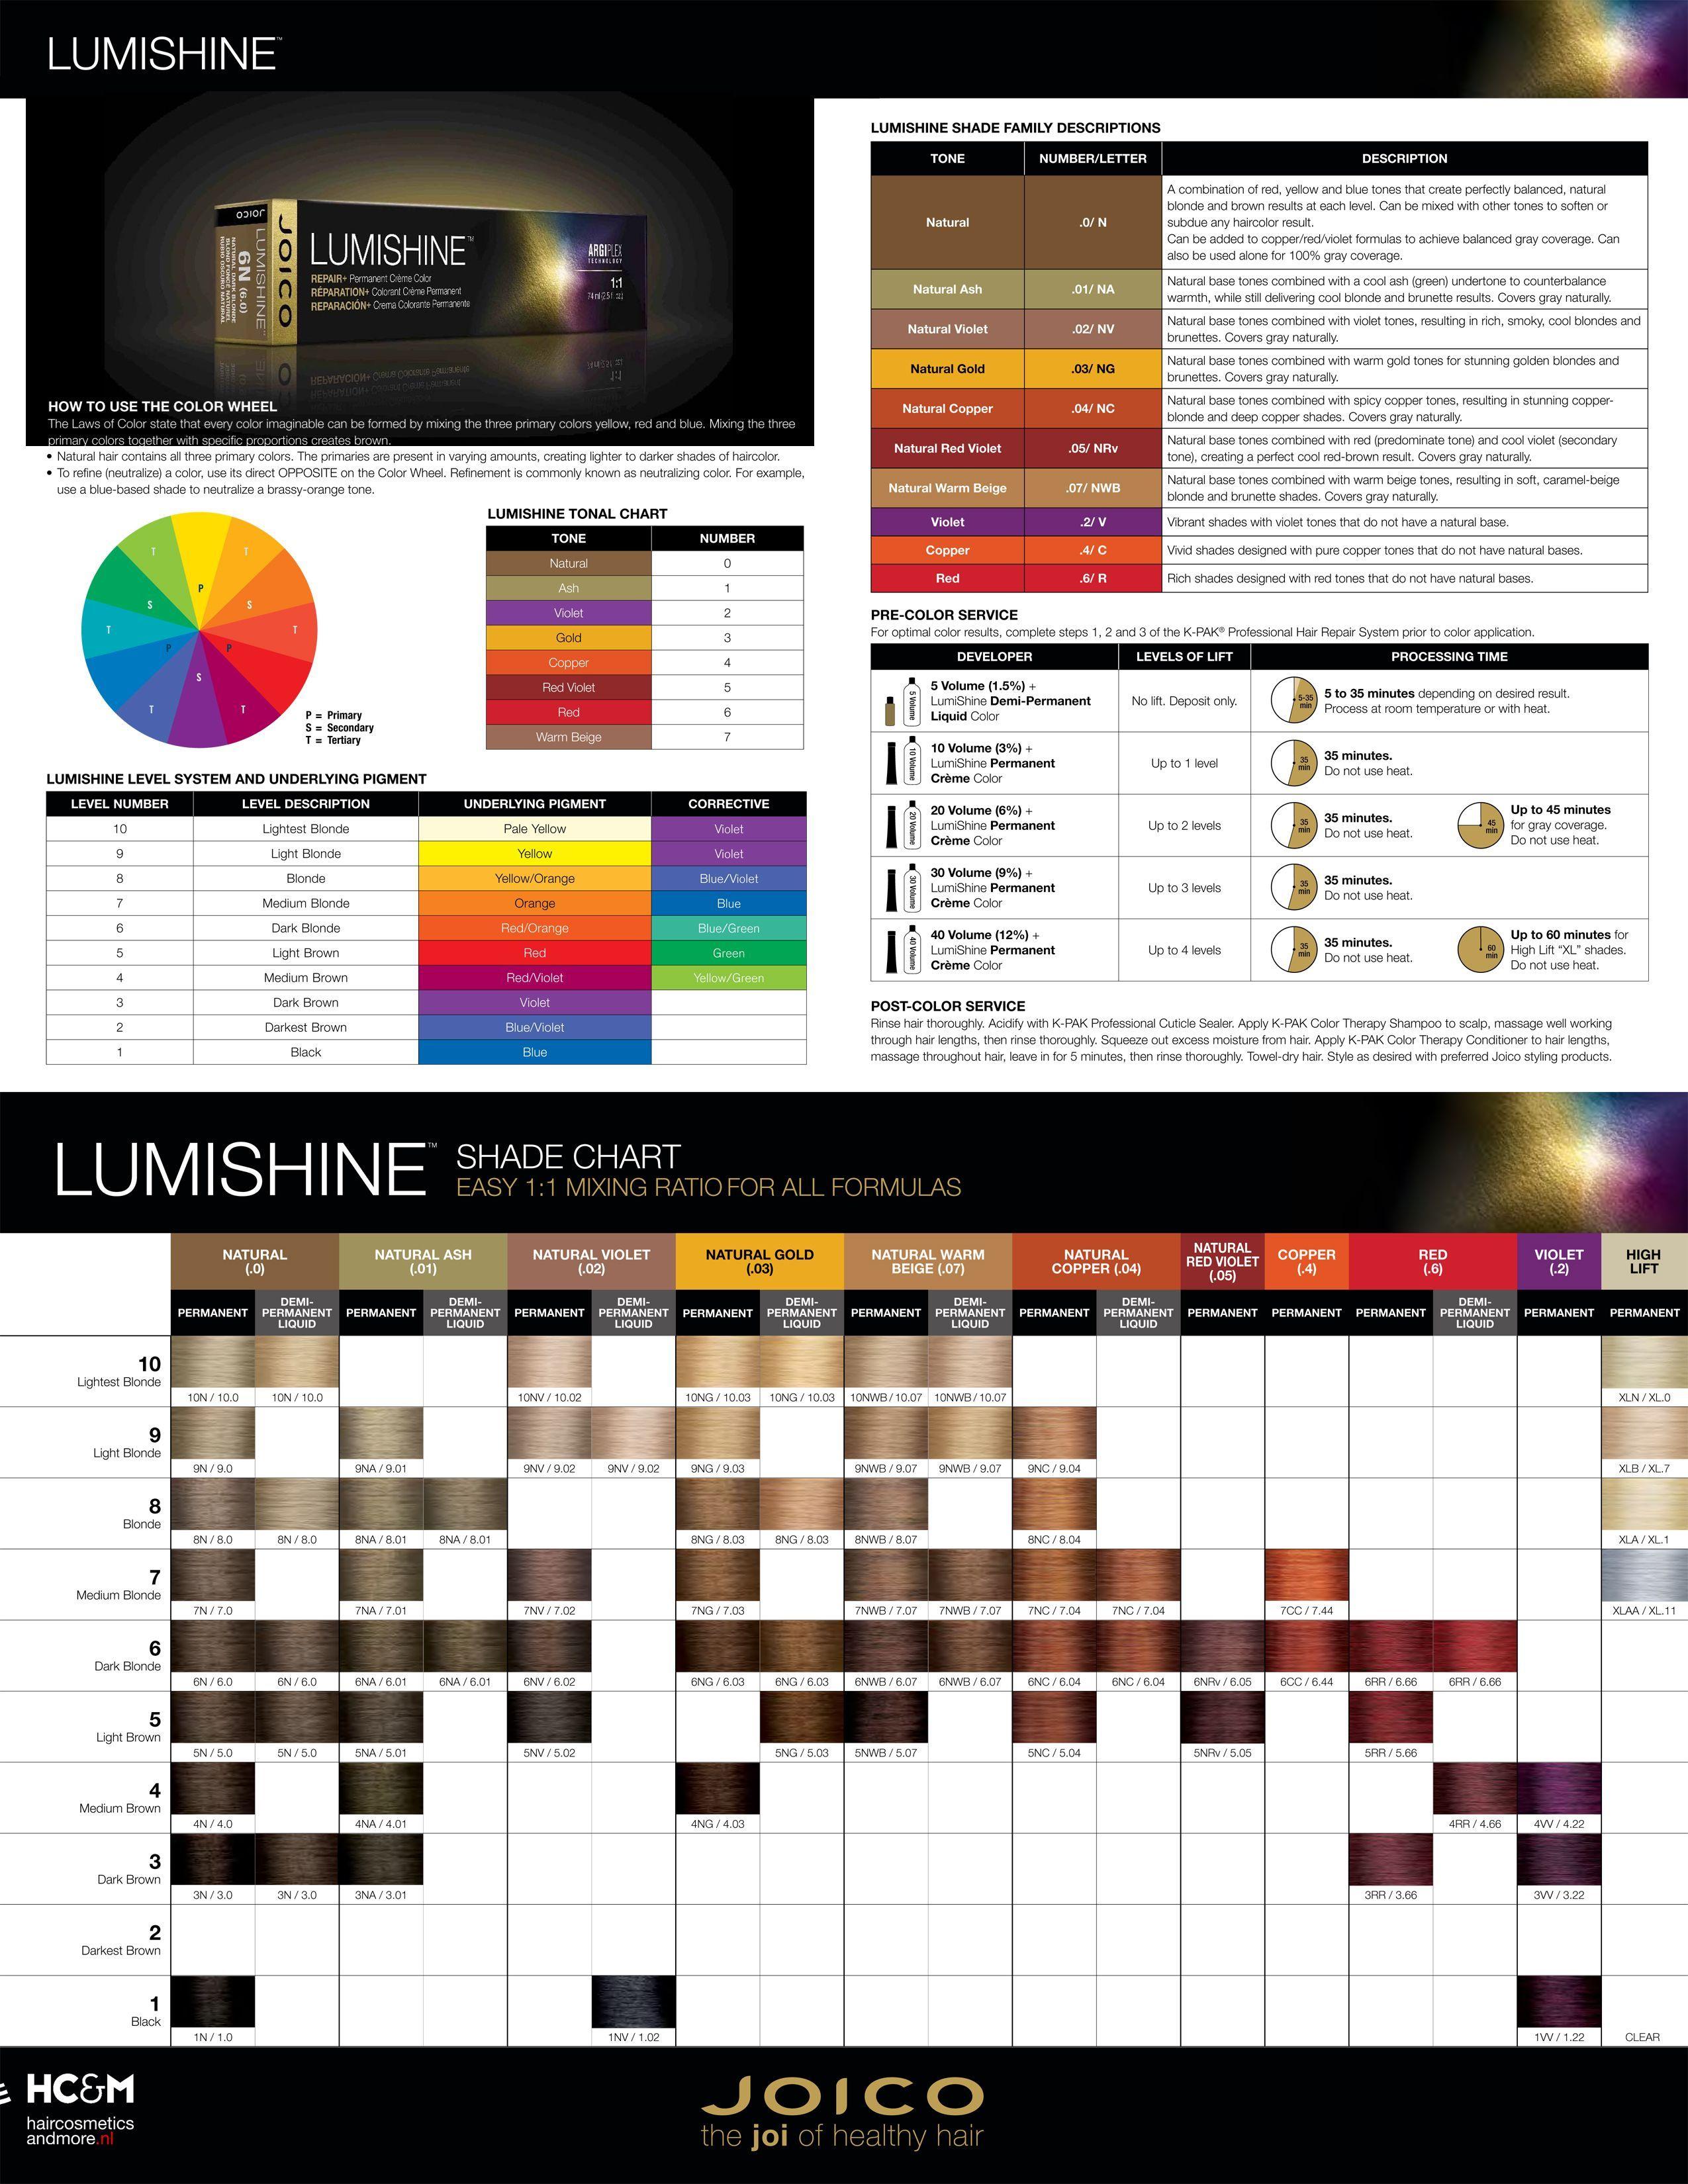 Joico Lumishine Shade Chart Chart Joico Lumishine Shade In 2020 Hair Color Chart Redken Color Chart Redken Color Fusion Chart